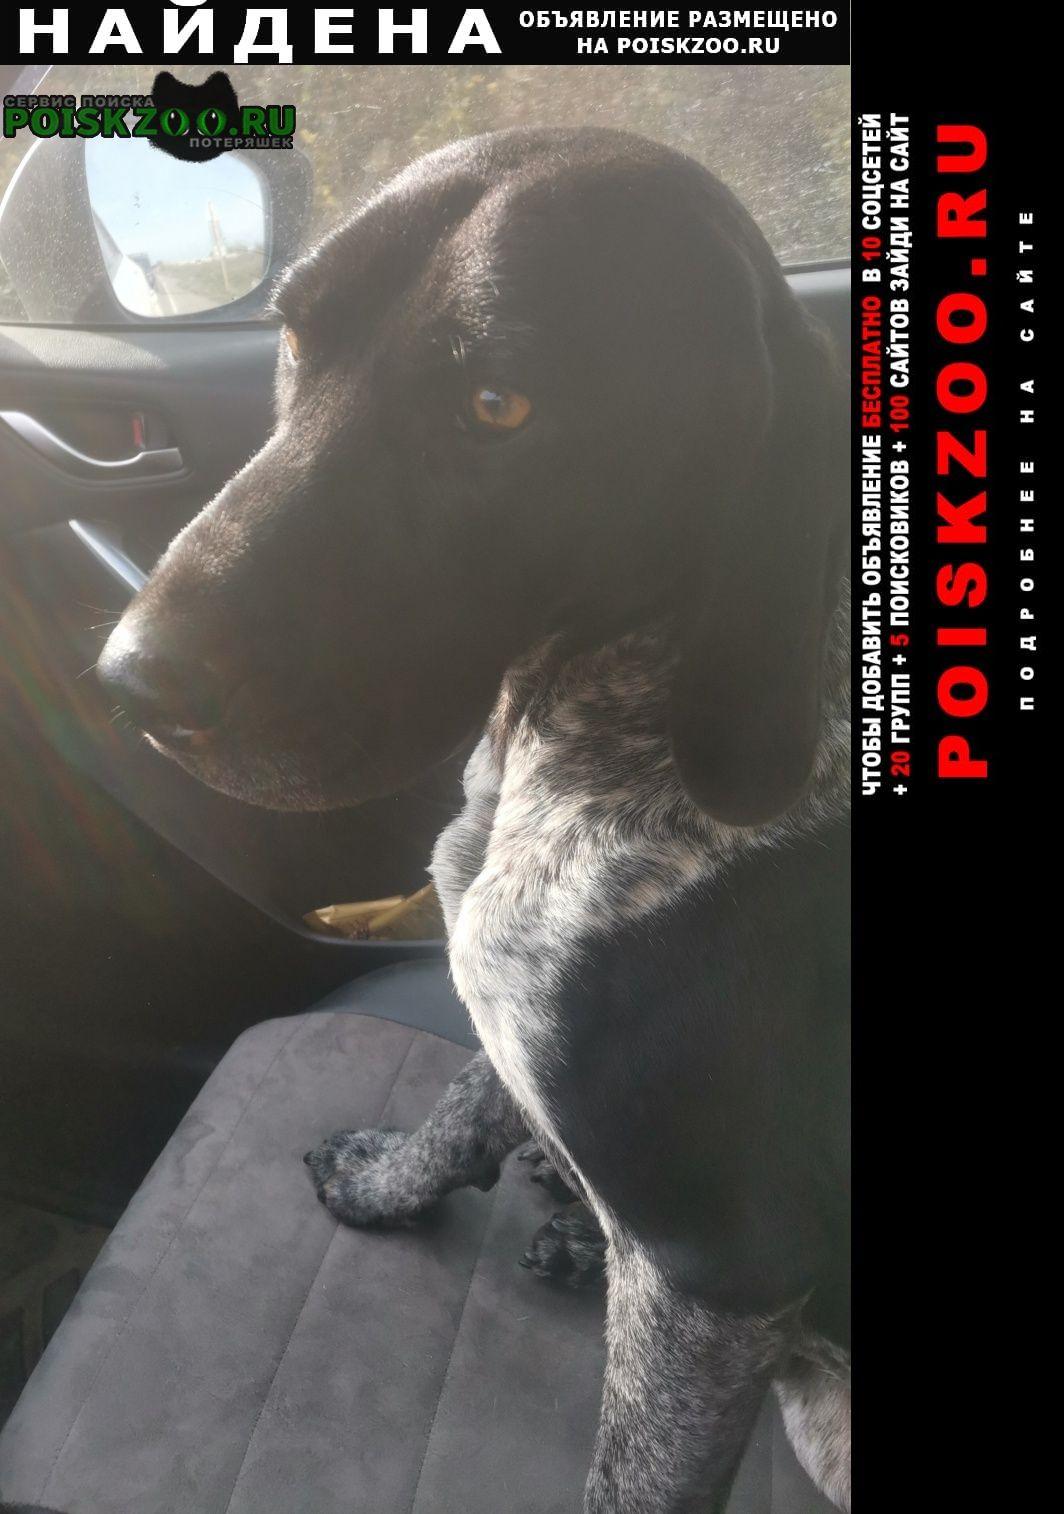 Найдена собака кобель на охоте в районе шапсугского водохранил Краснодар